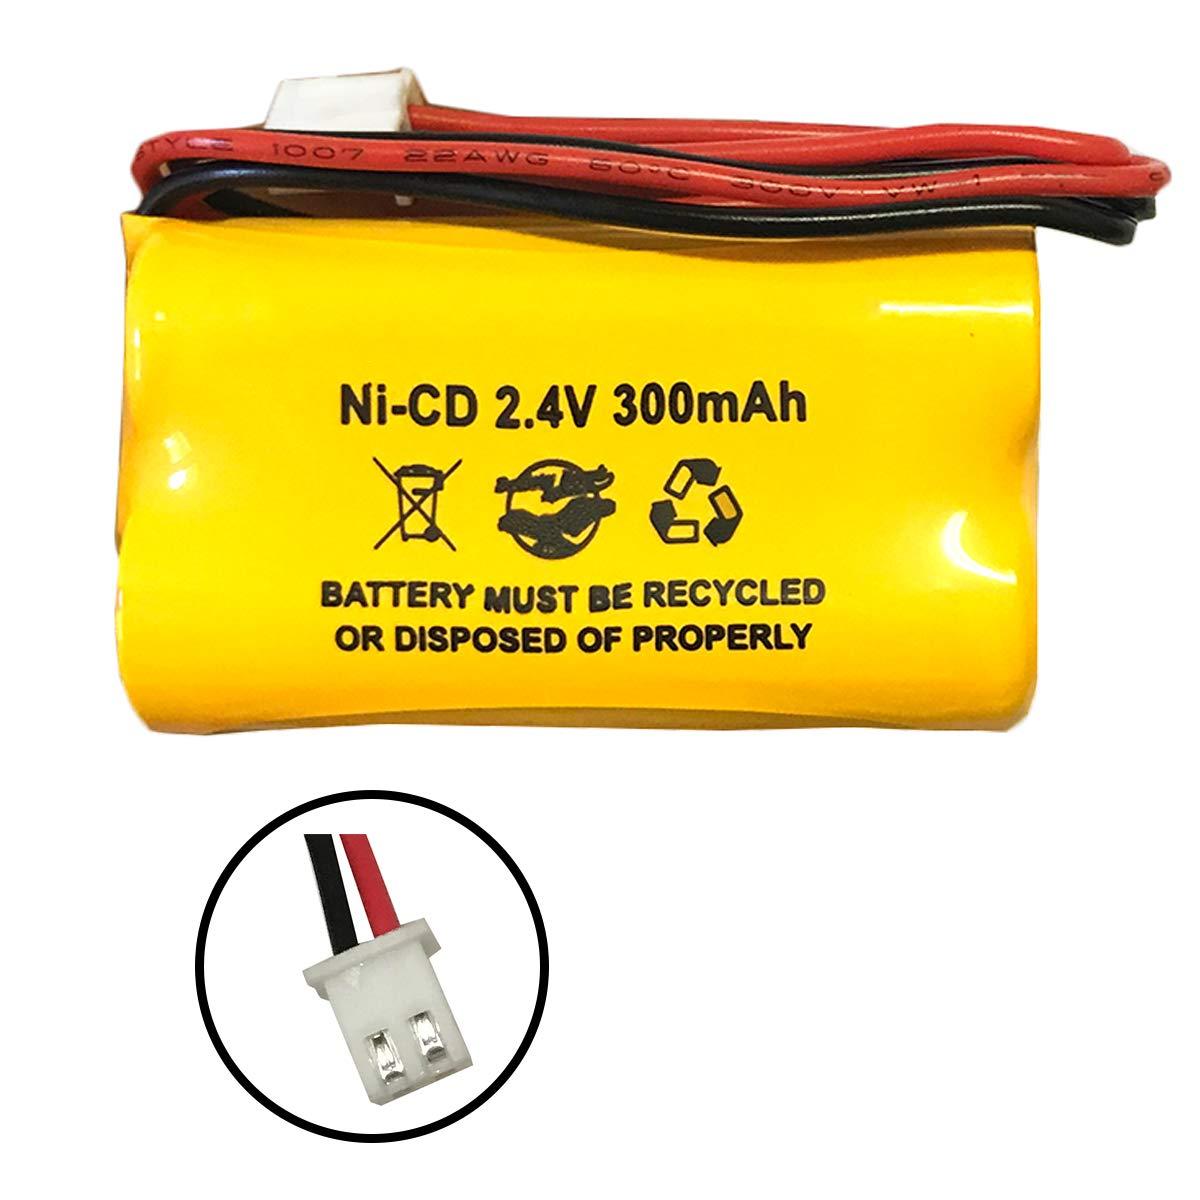 Amazon.com: Ni-CD AA300 mAh 2,4 V AA 300 mAh Ni-CD 2,4 V Ni ...